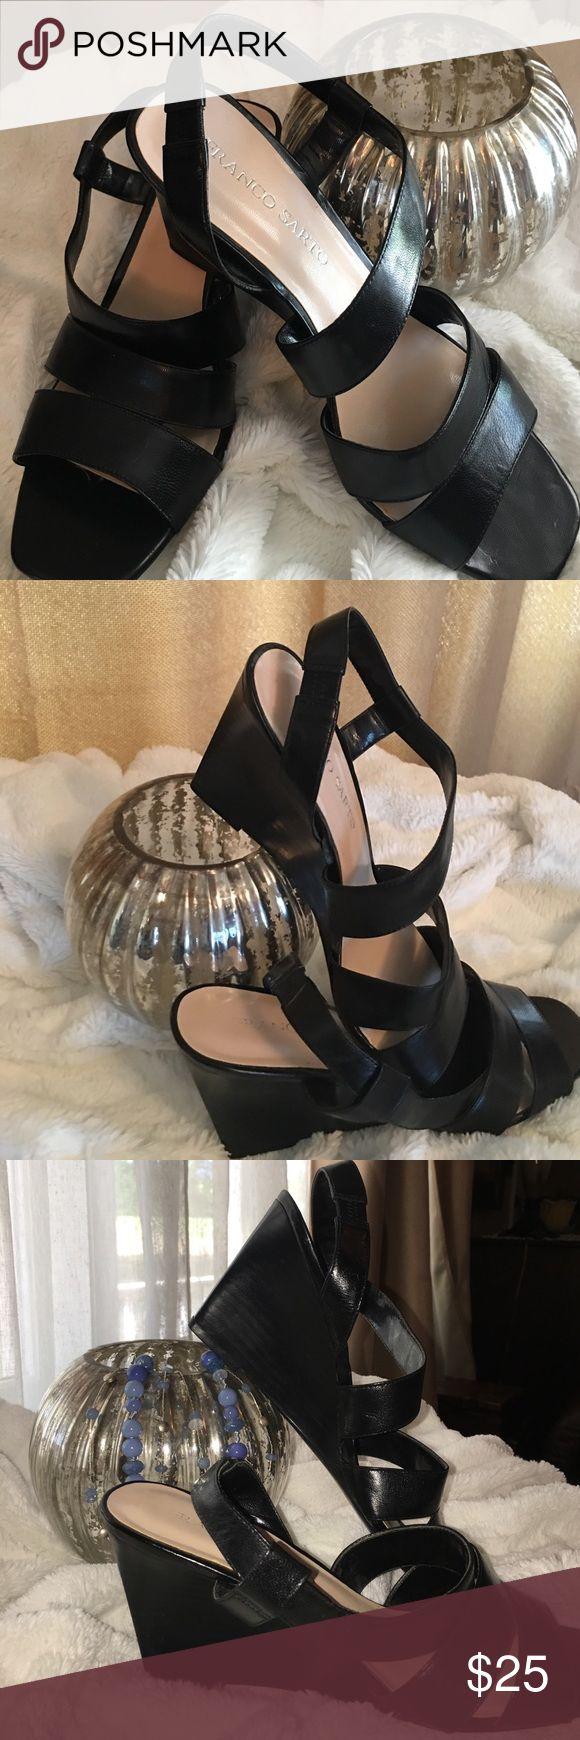 Franco Sarto Black Leather Upper Dressy Sandal Great Condition, Franco Sarto Black Leather Upper Dress Sandal Wedges with Sassy Cross-Over Strap Franco Sarto Shoes Wedges